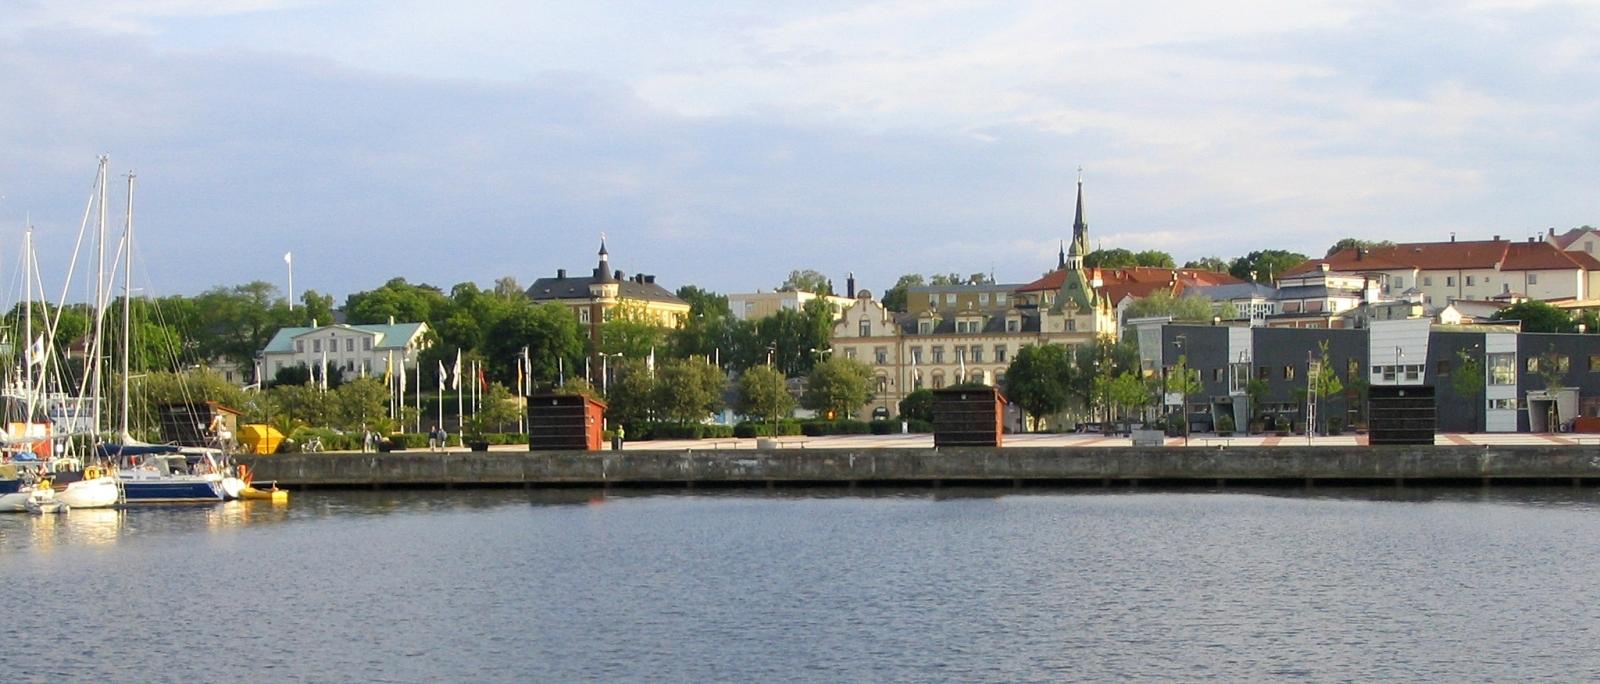 Oskarshamn